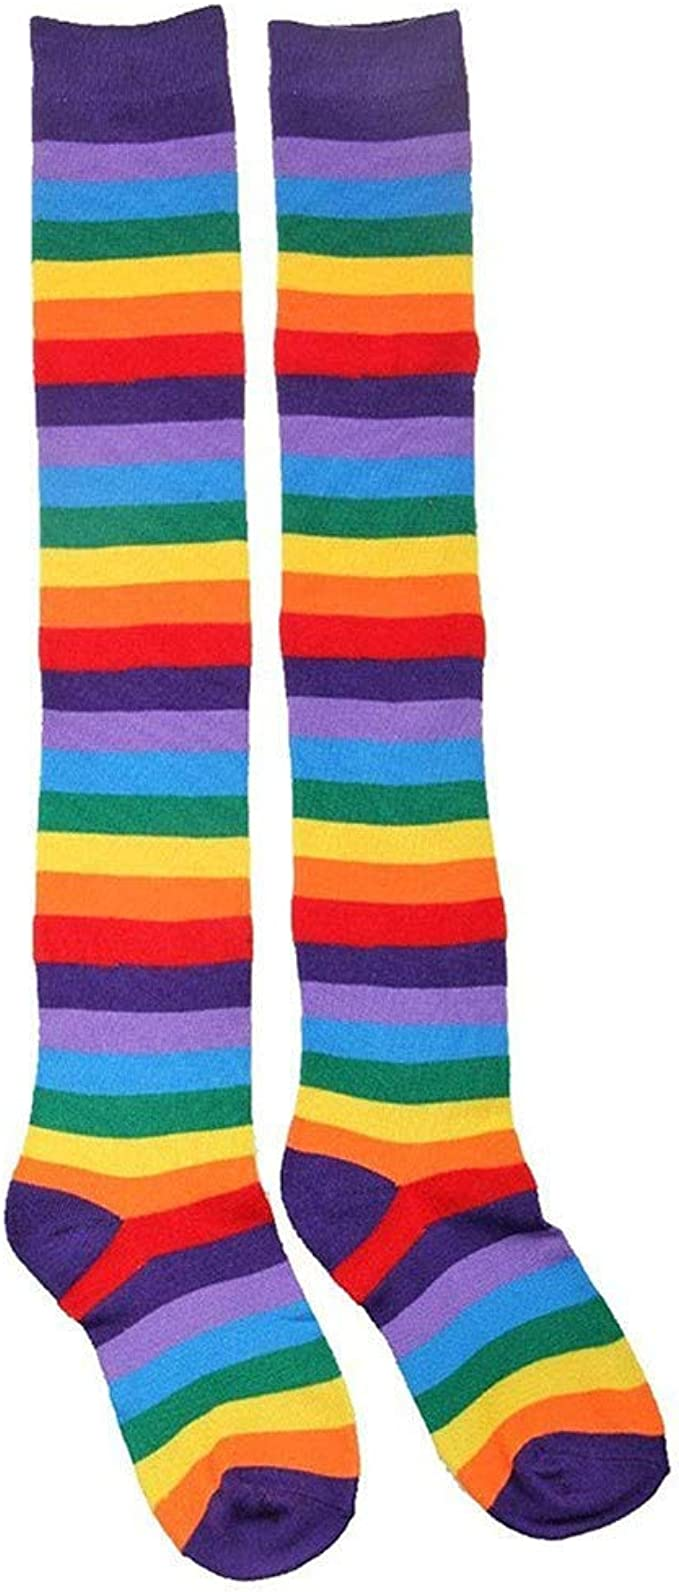 Tie Dye Womens Girl Cotton Socks Novelty Festival Party Present Fun Gift RAINBOW